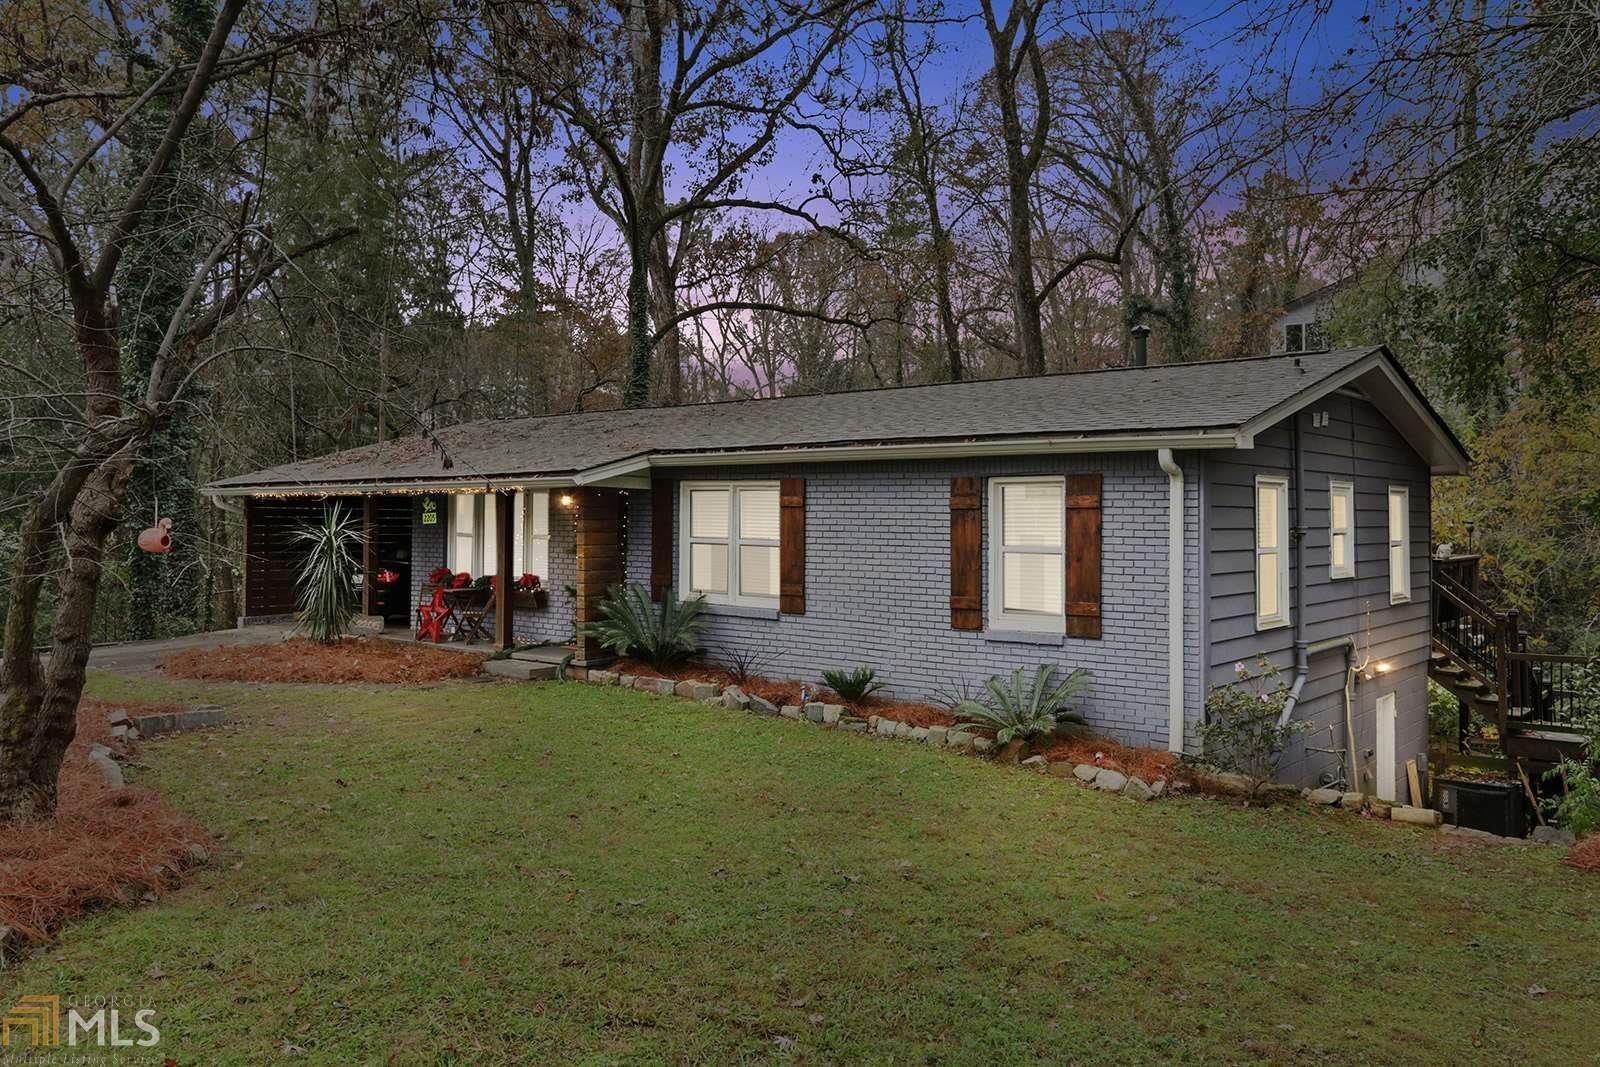 2205 Cavanaugh Ave, Atlanta, GA 30316 - MLS#: 8896526